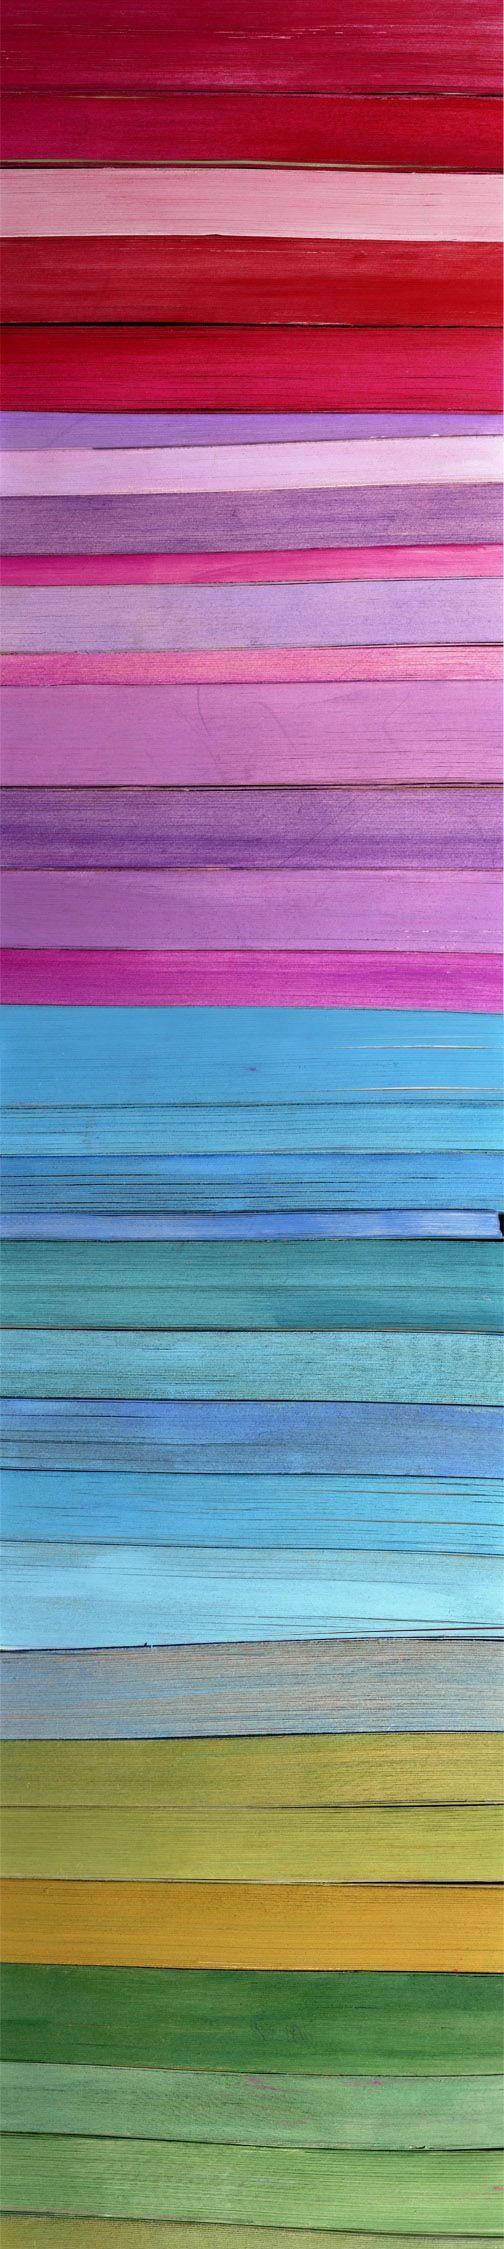 .Color Inspiration, Rainbows Colors, Parties Drinks, Reading Rainbows, Colors Palettes, Parsley Steinweiss, Rainbows Colours, Colours Palettes, Colors Inspiration